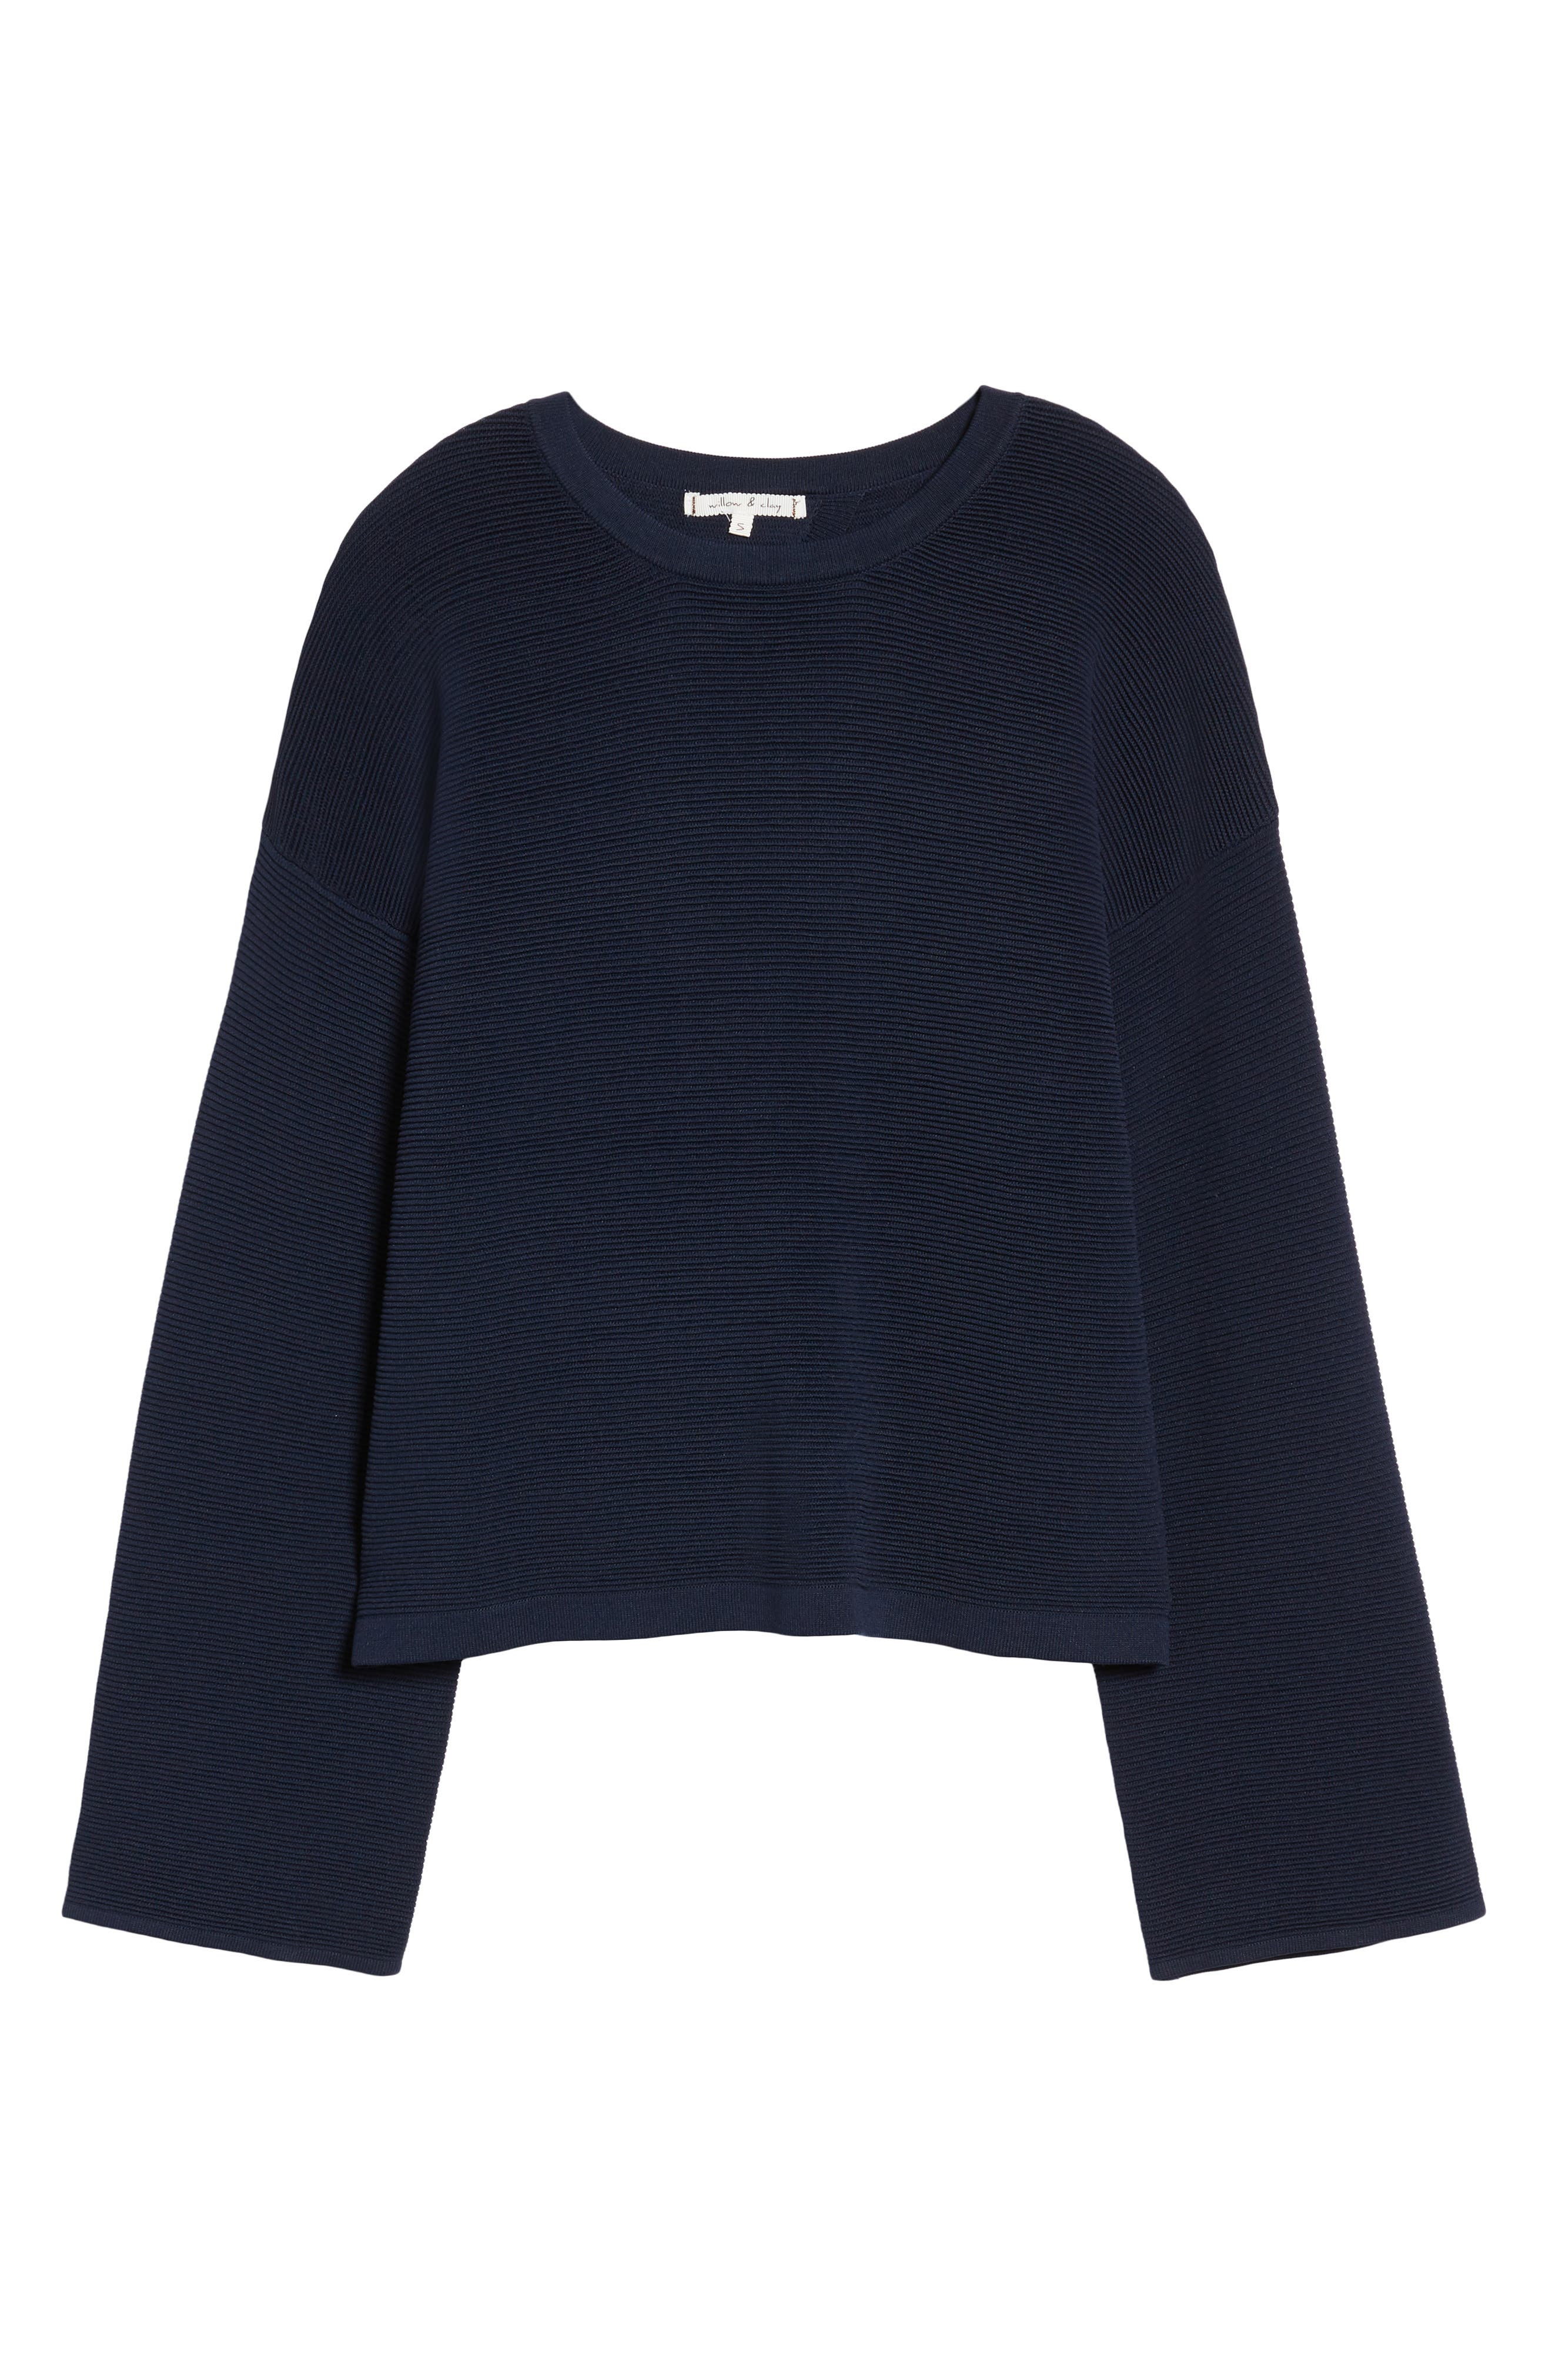 Cutout Ribbed Sweater,                             Alternate thumbnail 6, color,                             Navy